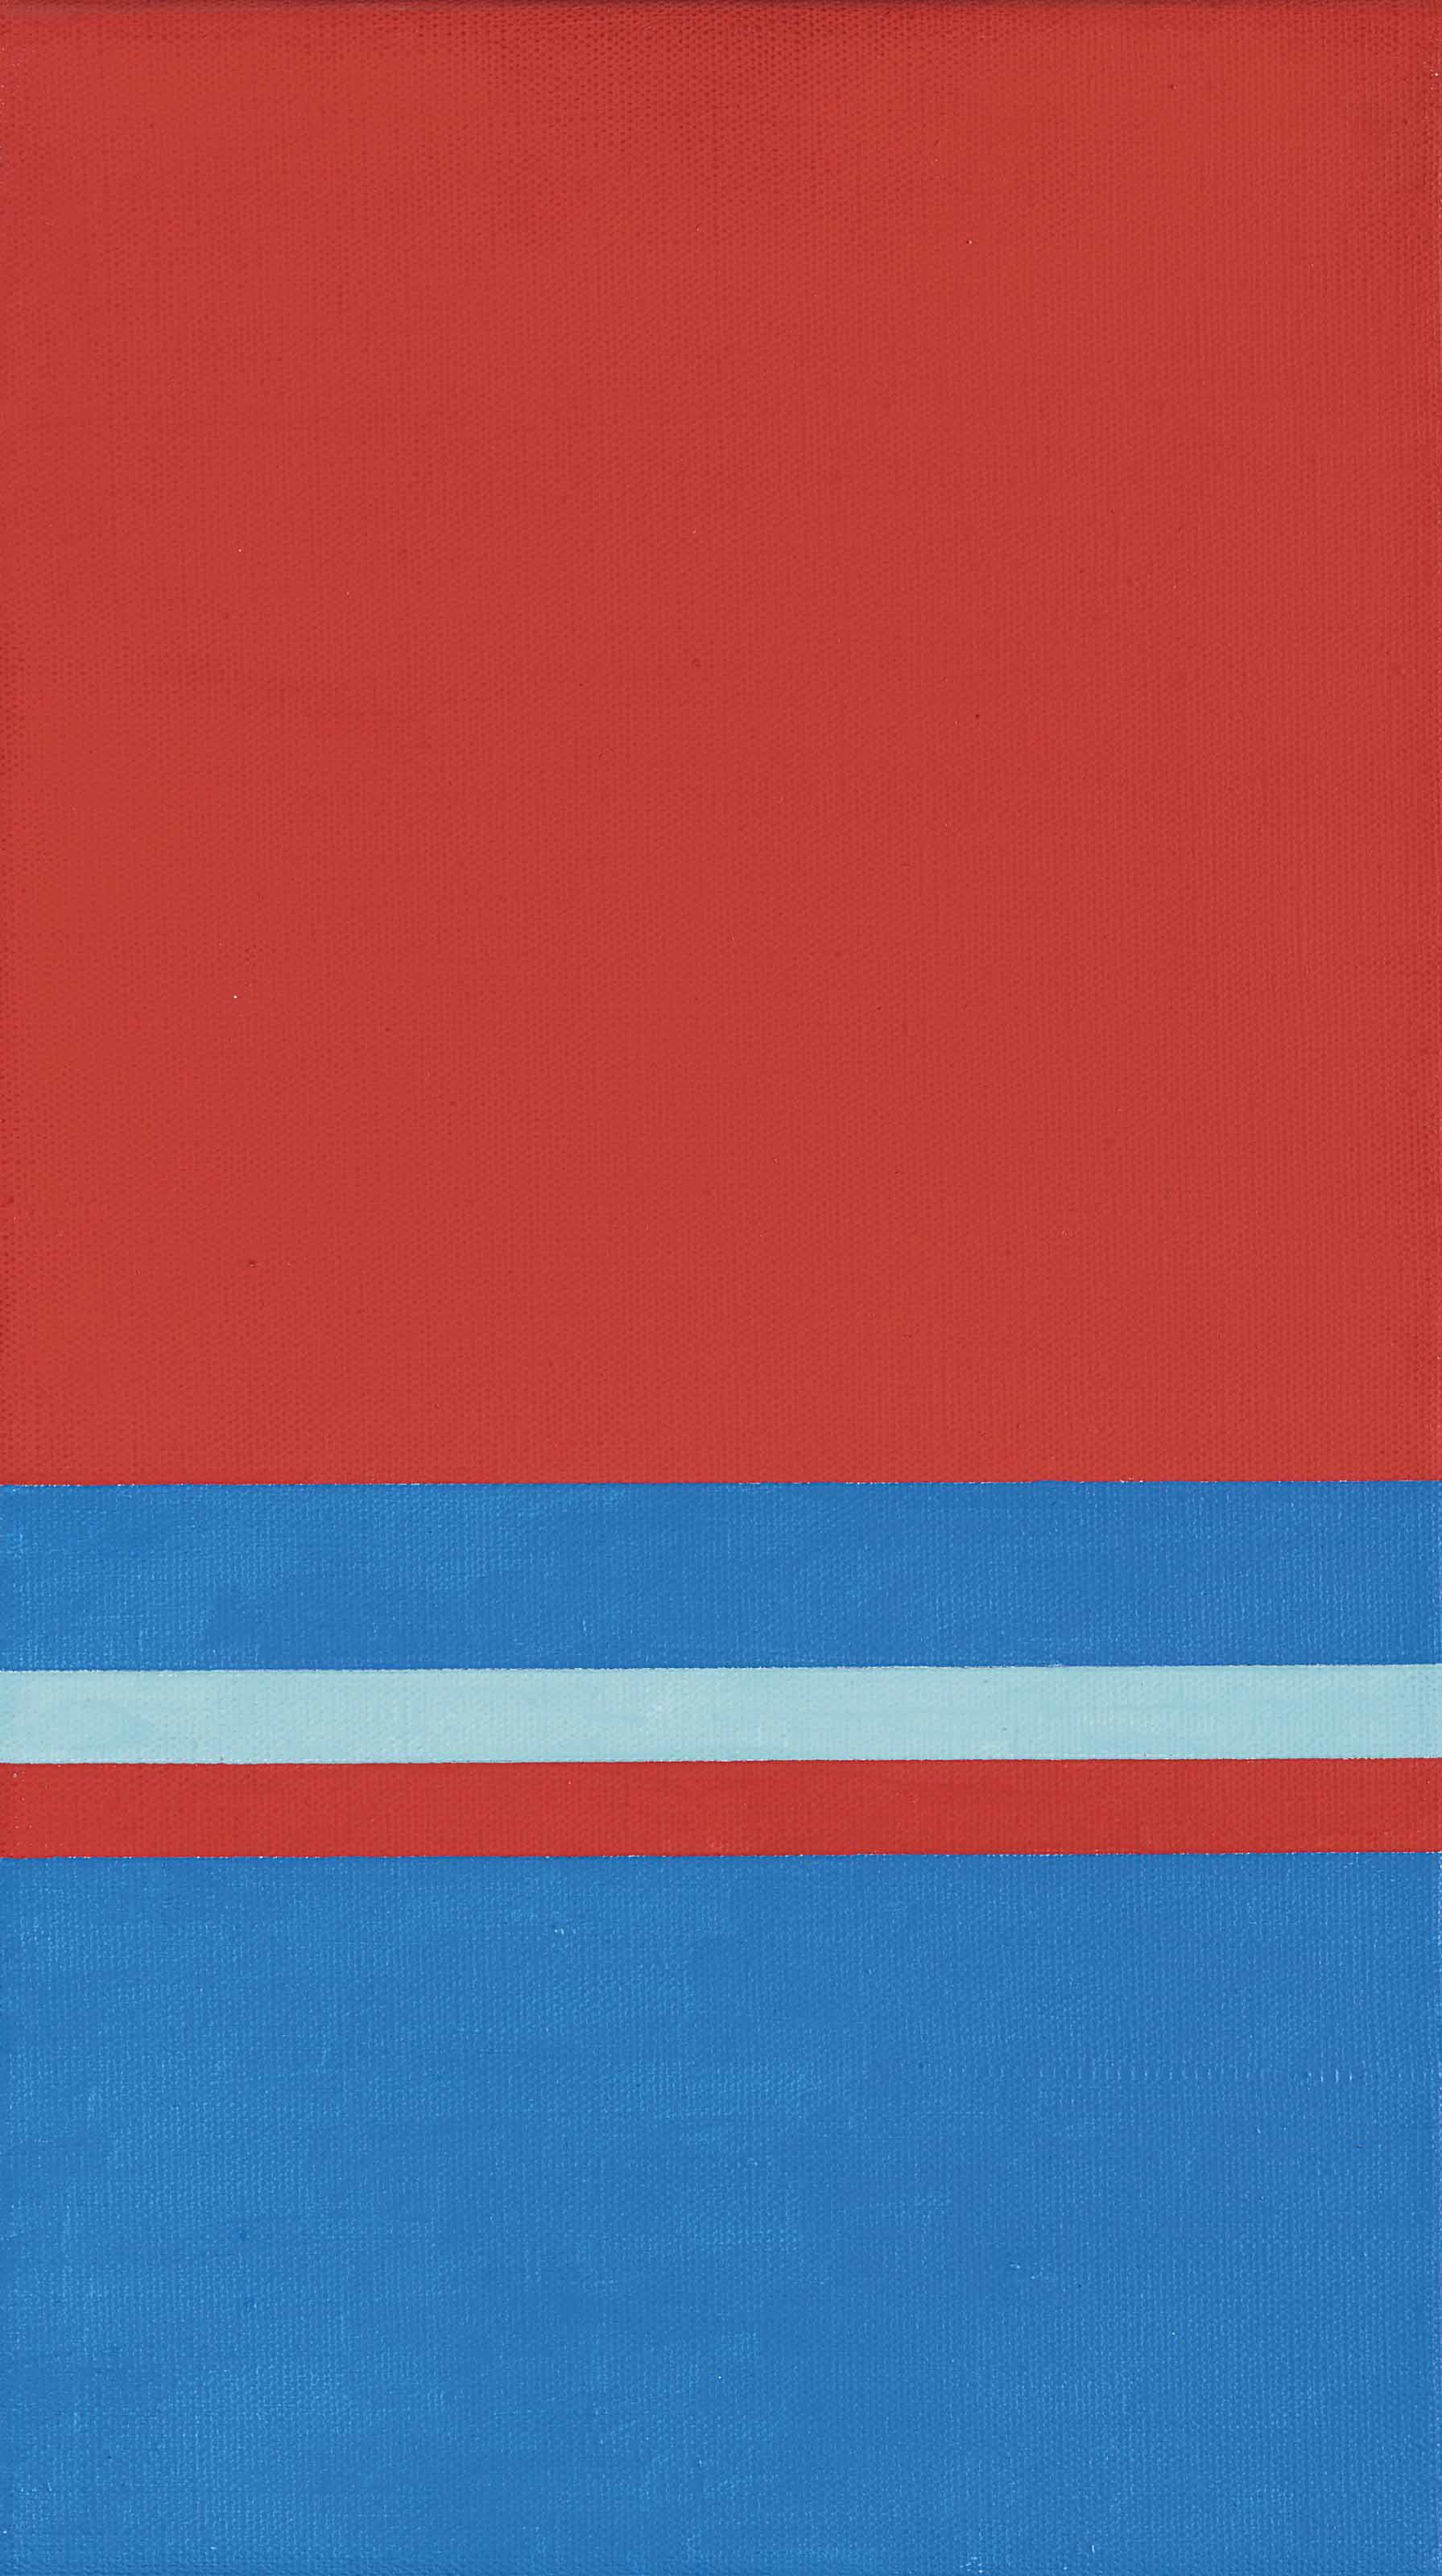 Rot-Blau-Grün-Relation, 1958/62